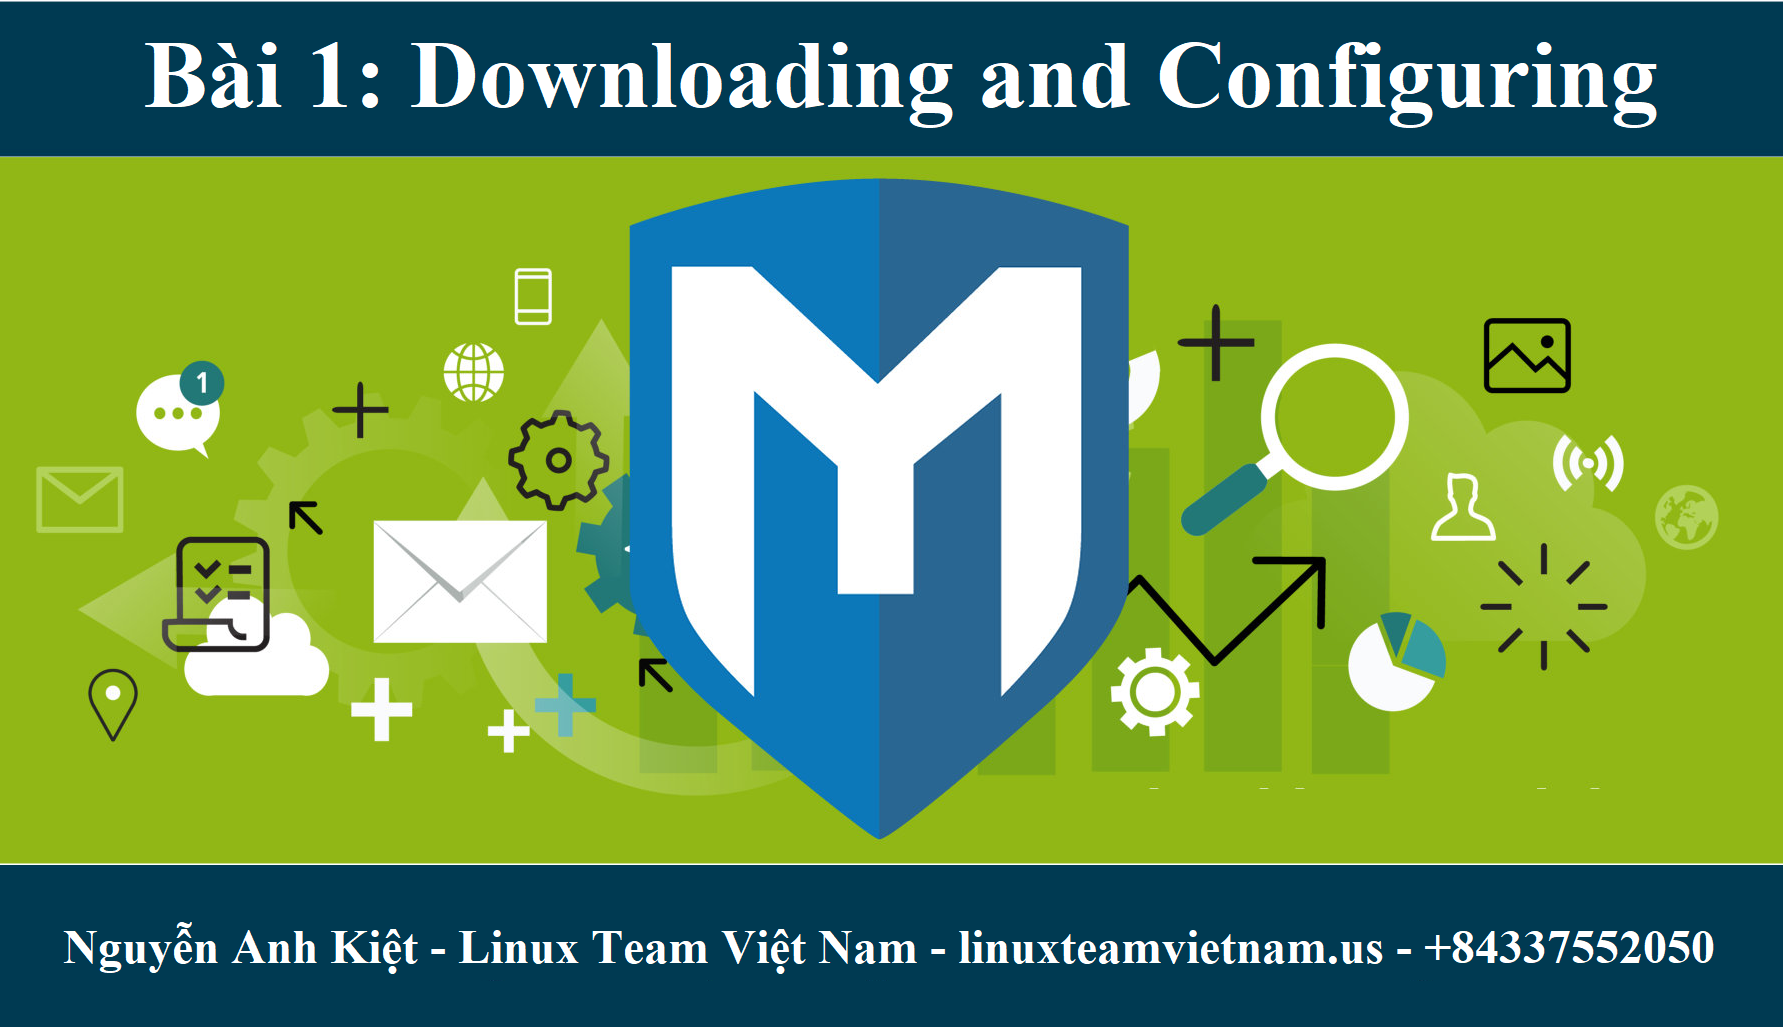 [Metasploitable 2 – Exploit toàn tập] Bài 1: Downloading and Configuring